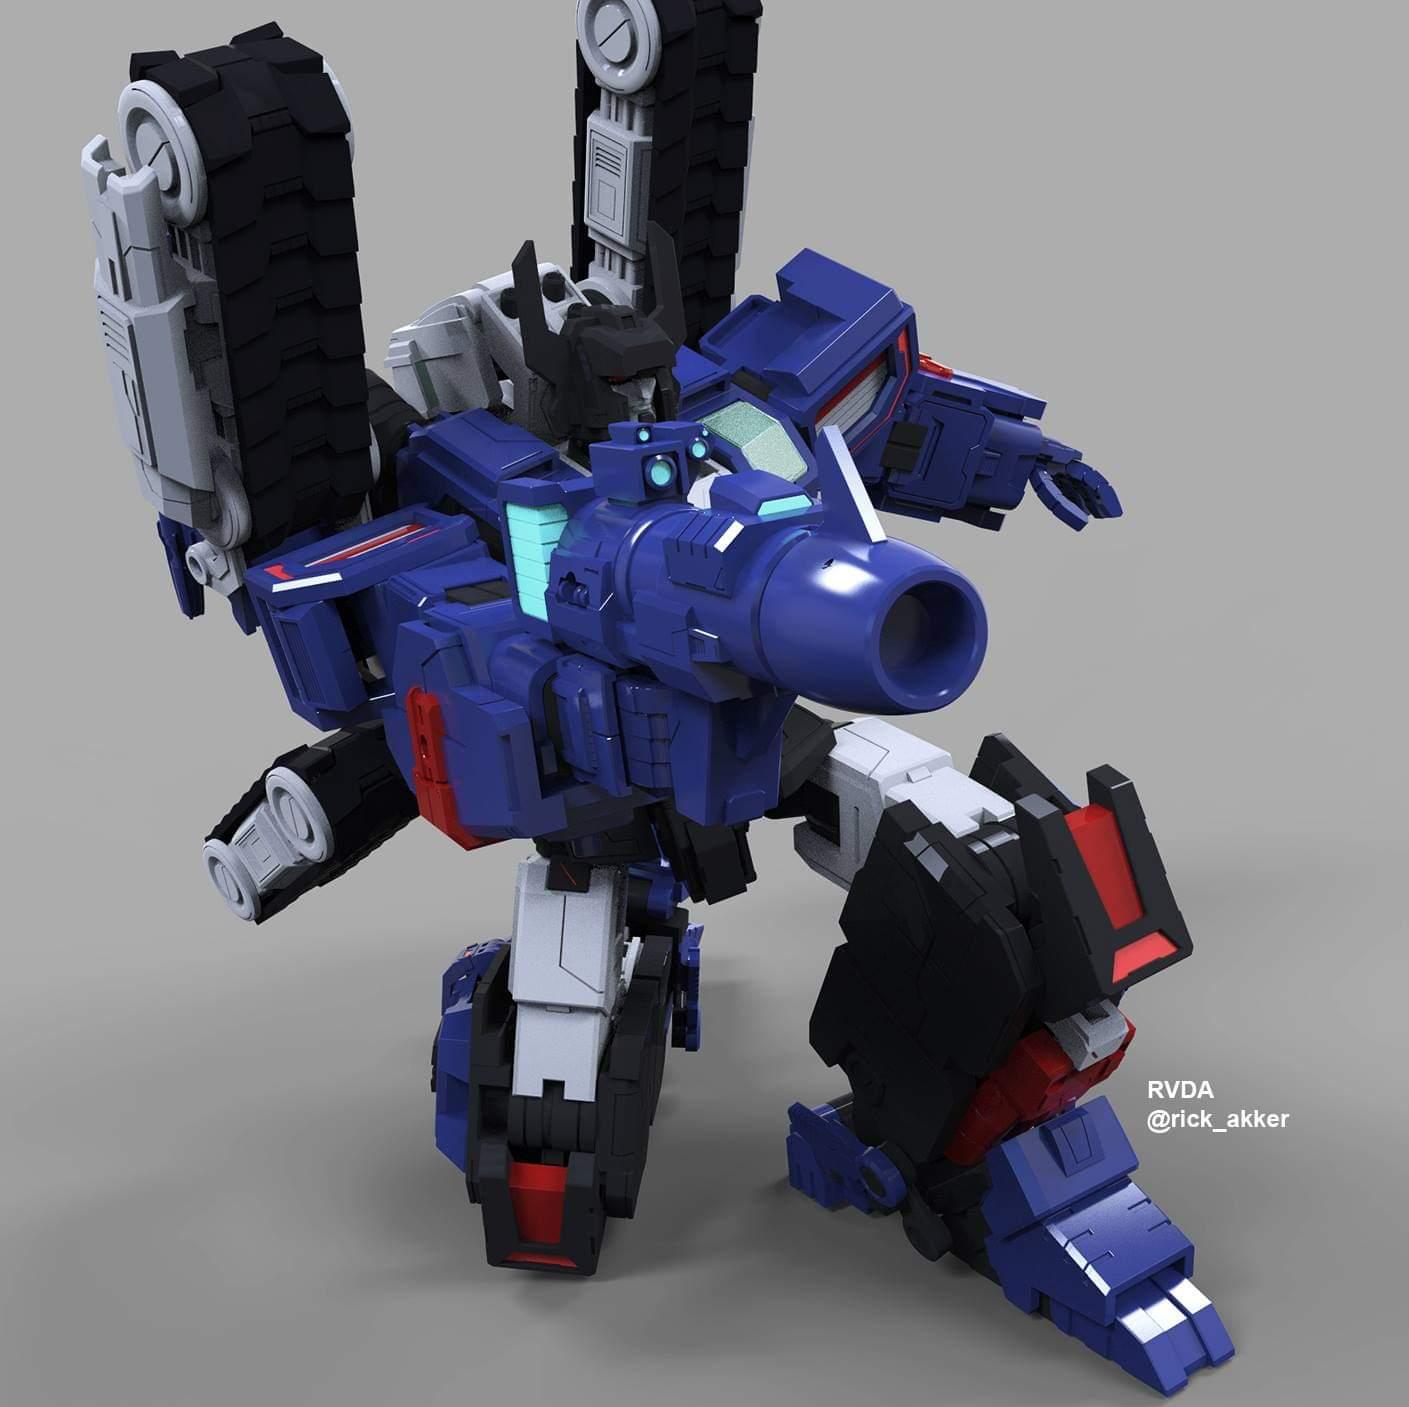 [Mastermind Creations] Produit Tiers - Reformatted R-50 Supermax - aka Fortress/Forteresse Maximus des BD IDW CV1q4DoQ_o